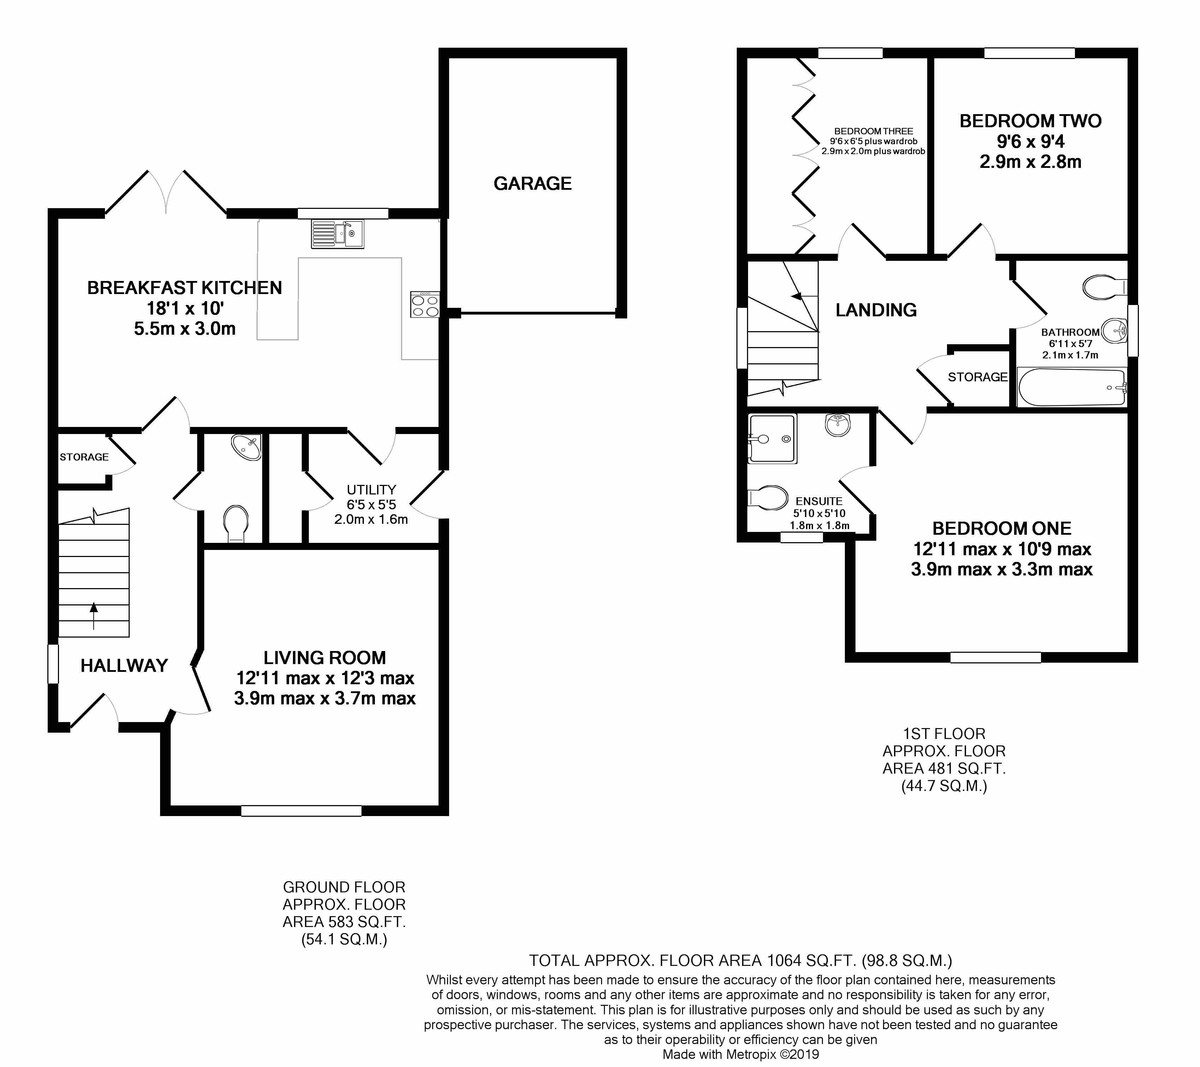 Ansell Way, Harborne floorplan 1 of 1